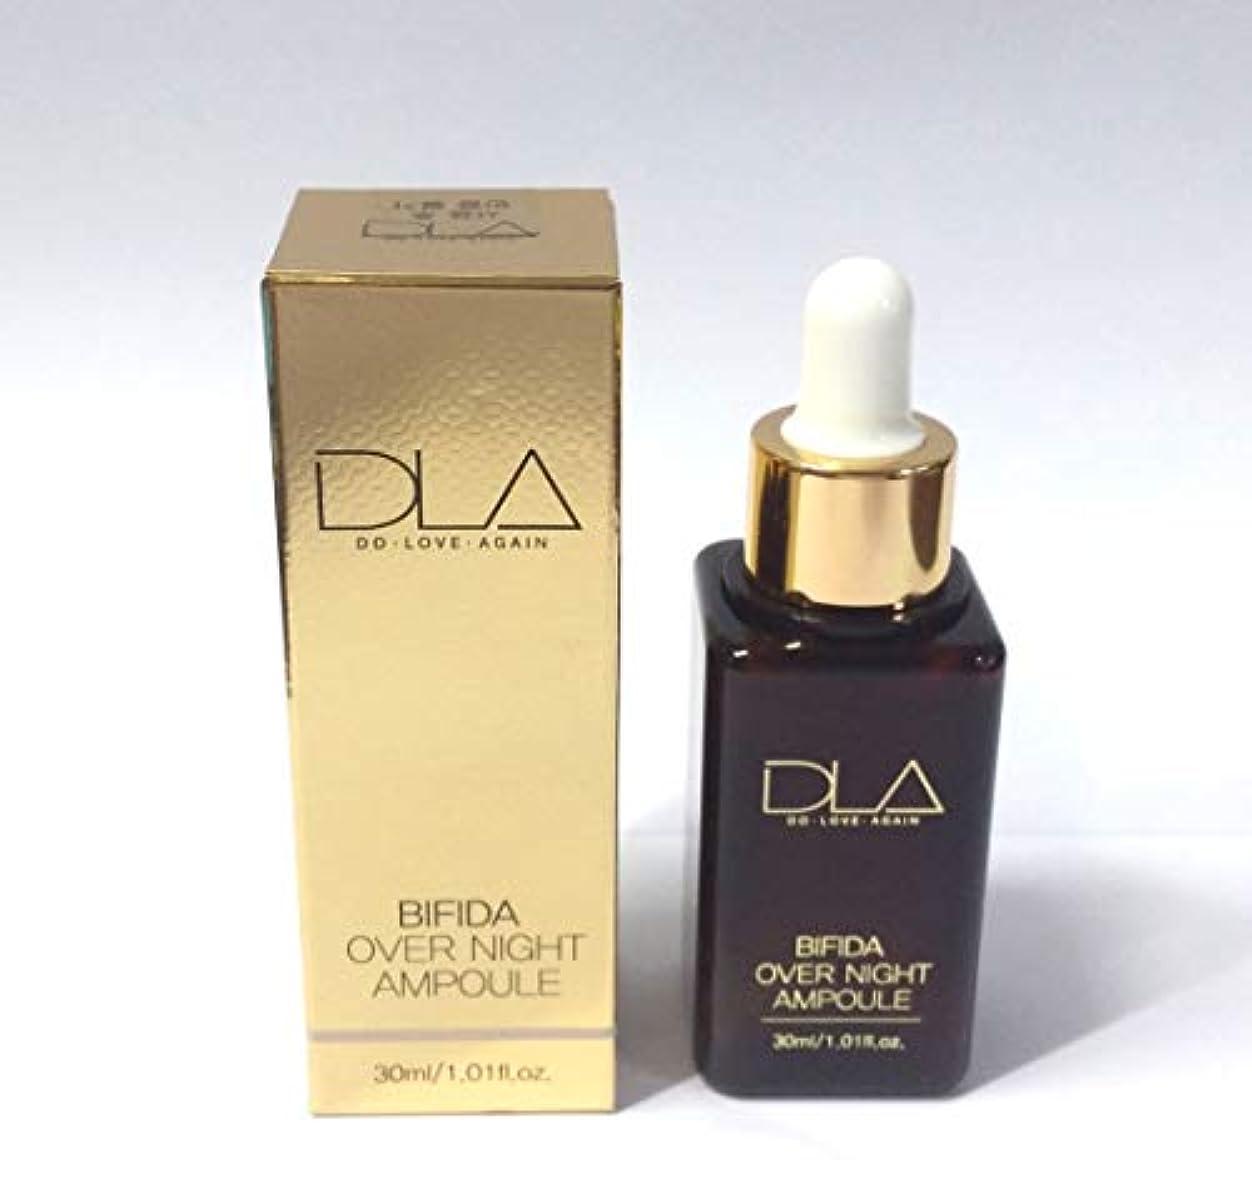 [DLA] ビフィダオーバーナイトアンプル30ml / Bifida Over Night Ampoule 30ml / ホワイトニング、スムース、弾力/韓国化粧品 / Whitening, smoother, elasticity...